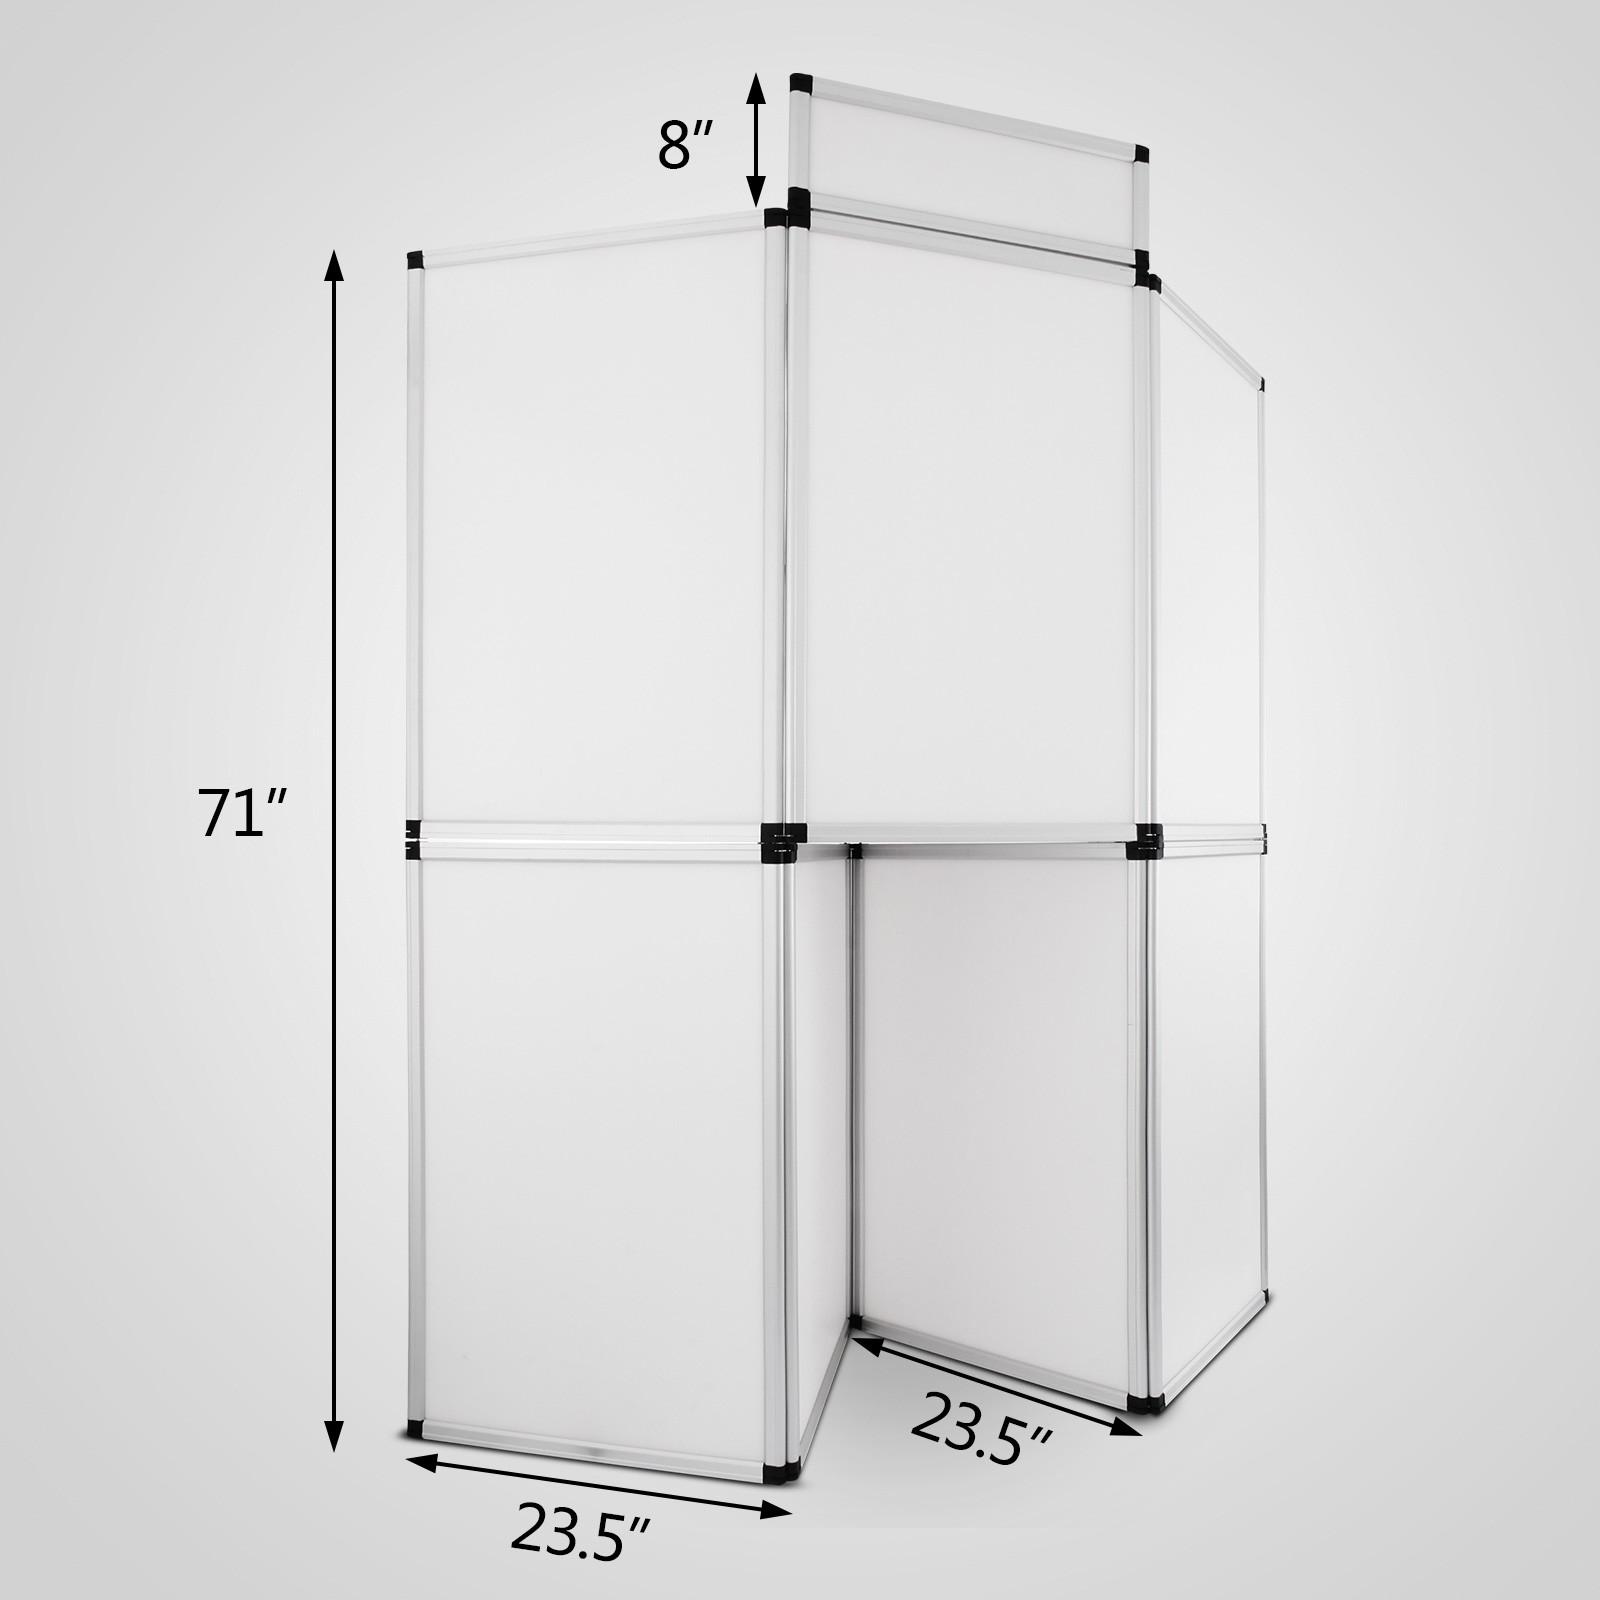 Portable Exhibition Board : Panel exhibition folding banner display board trade show